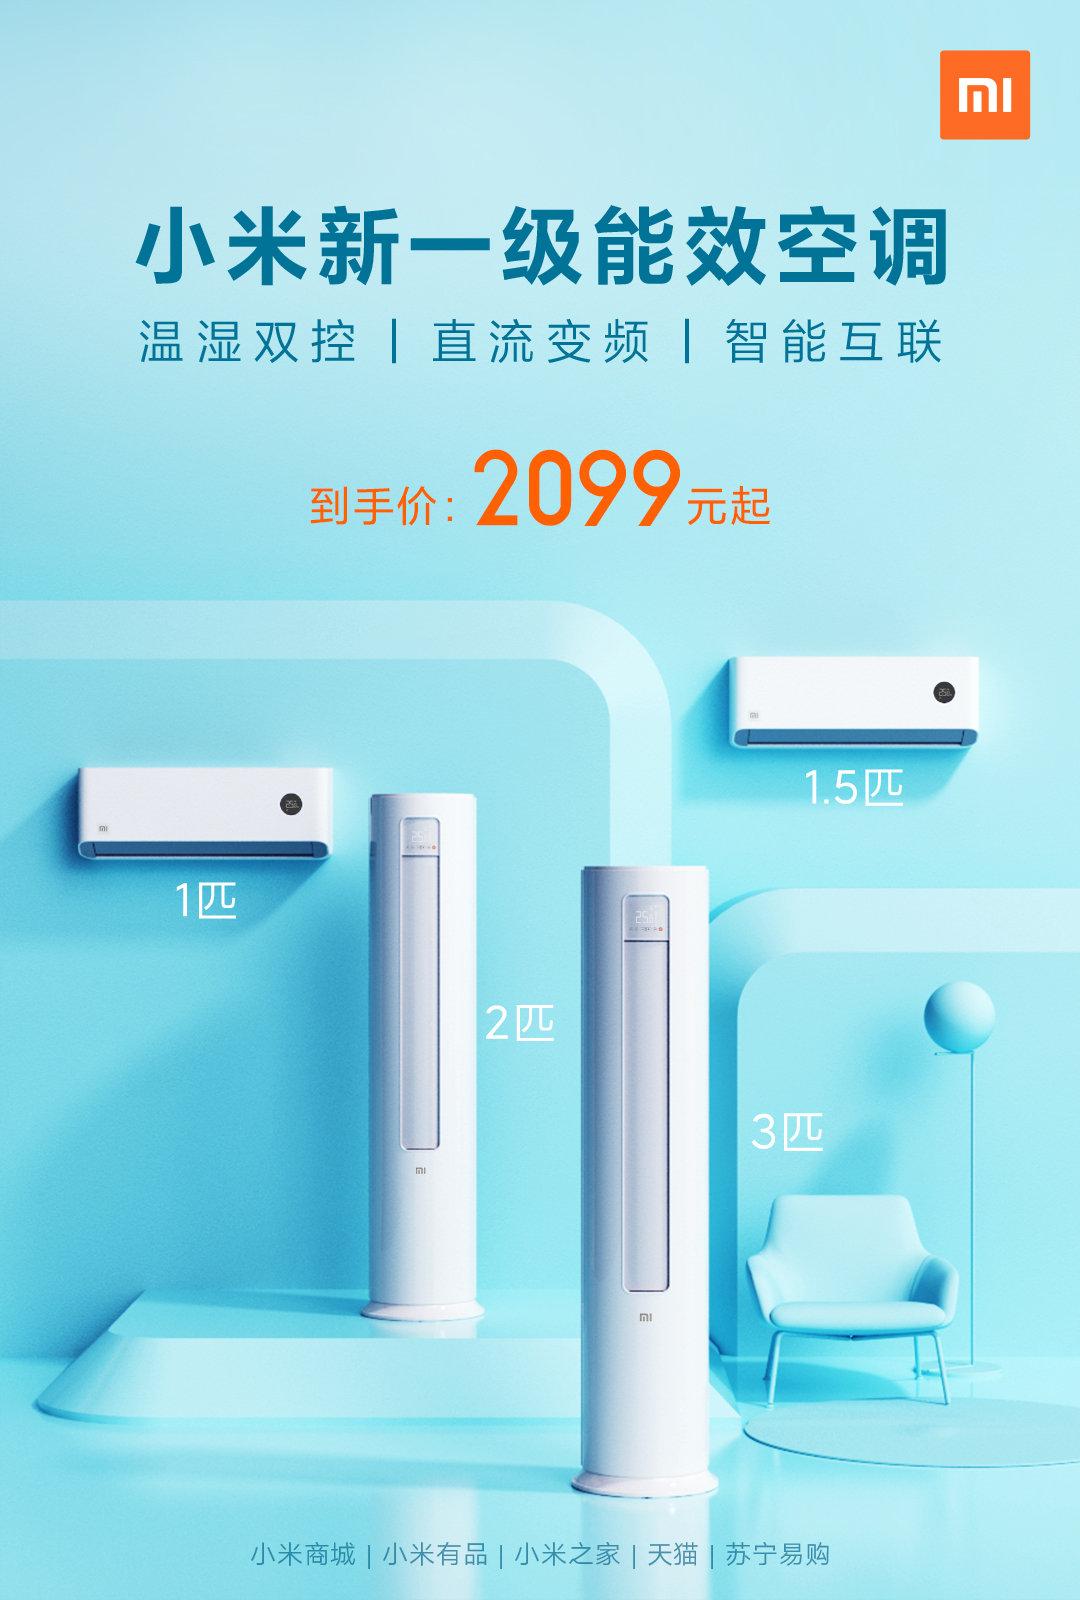 Xiaomi air Conditioner